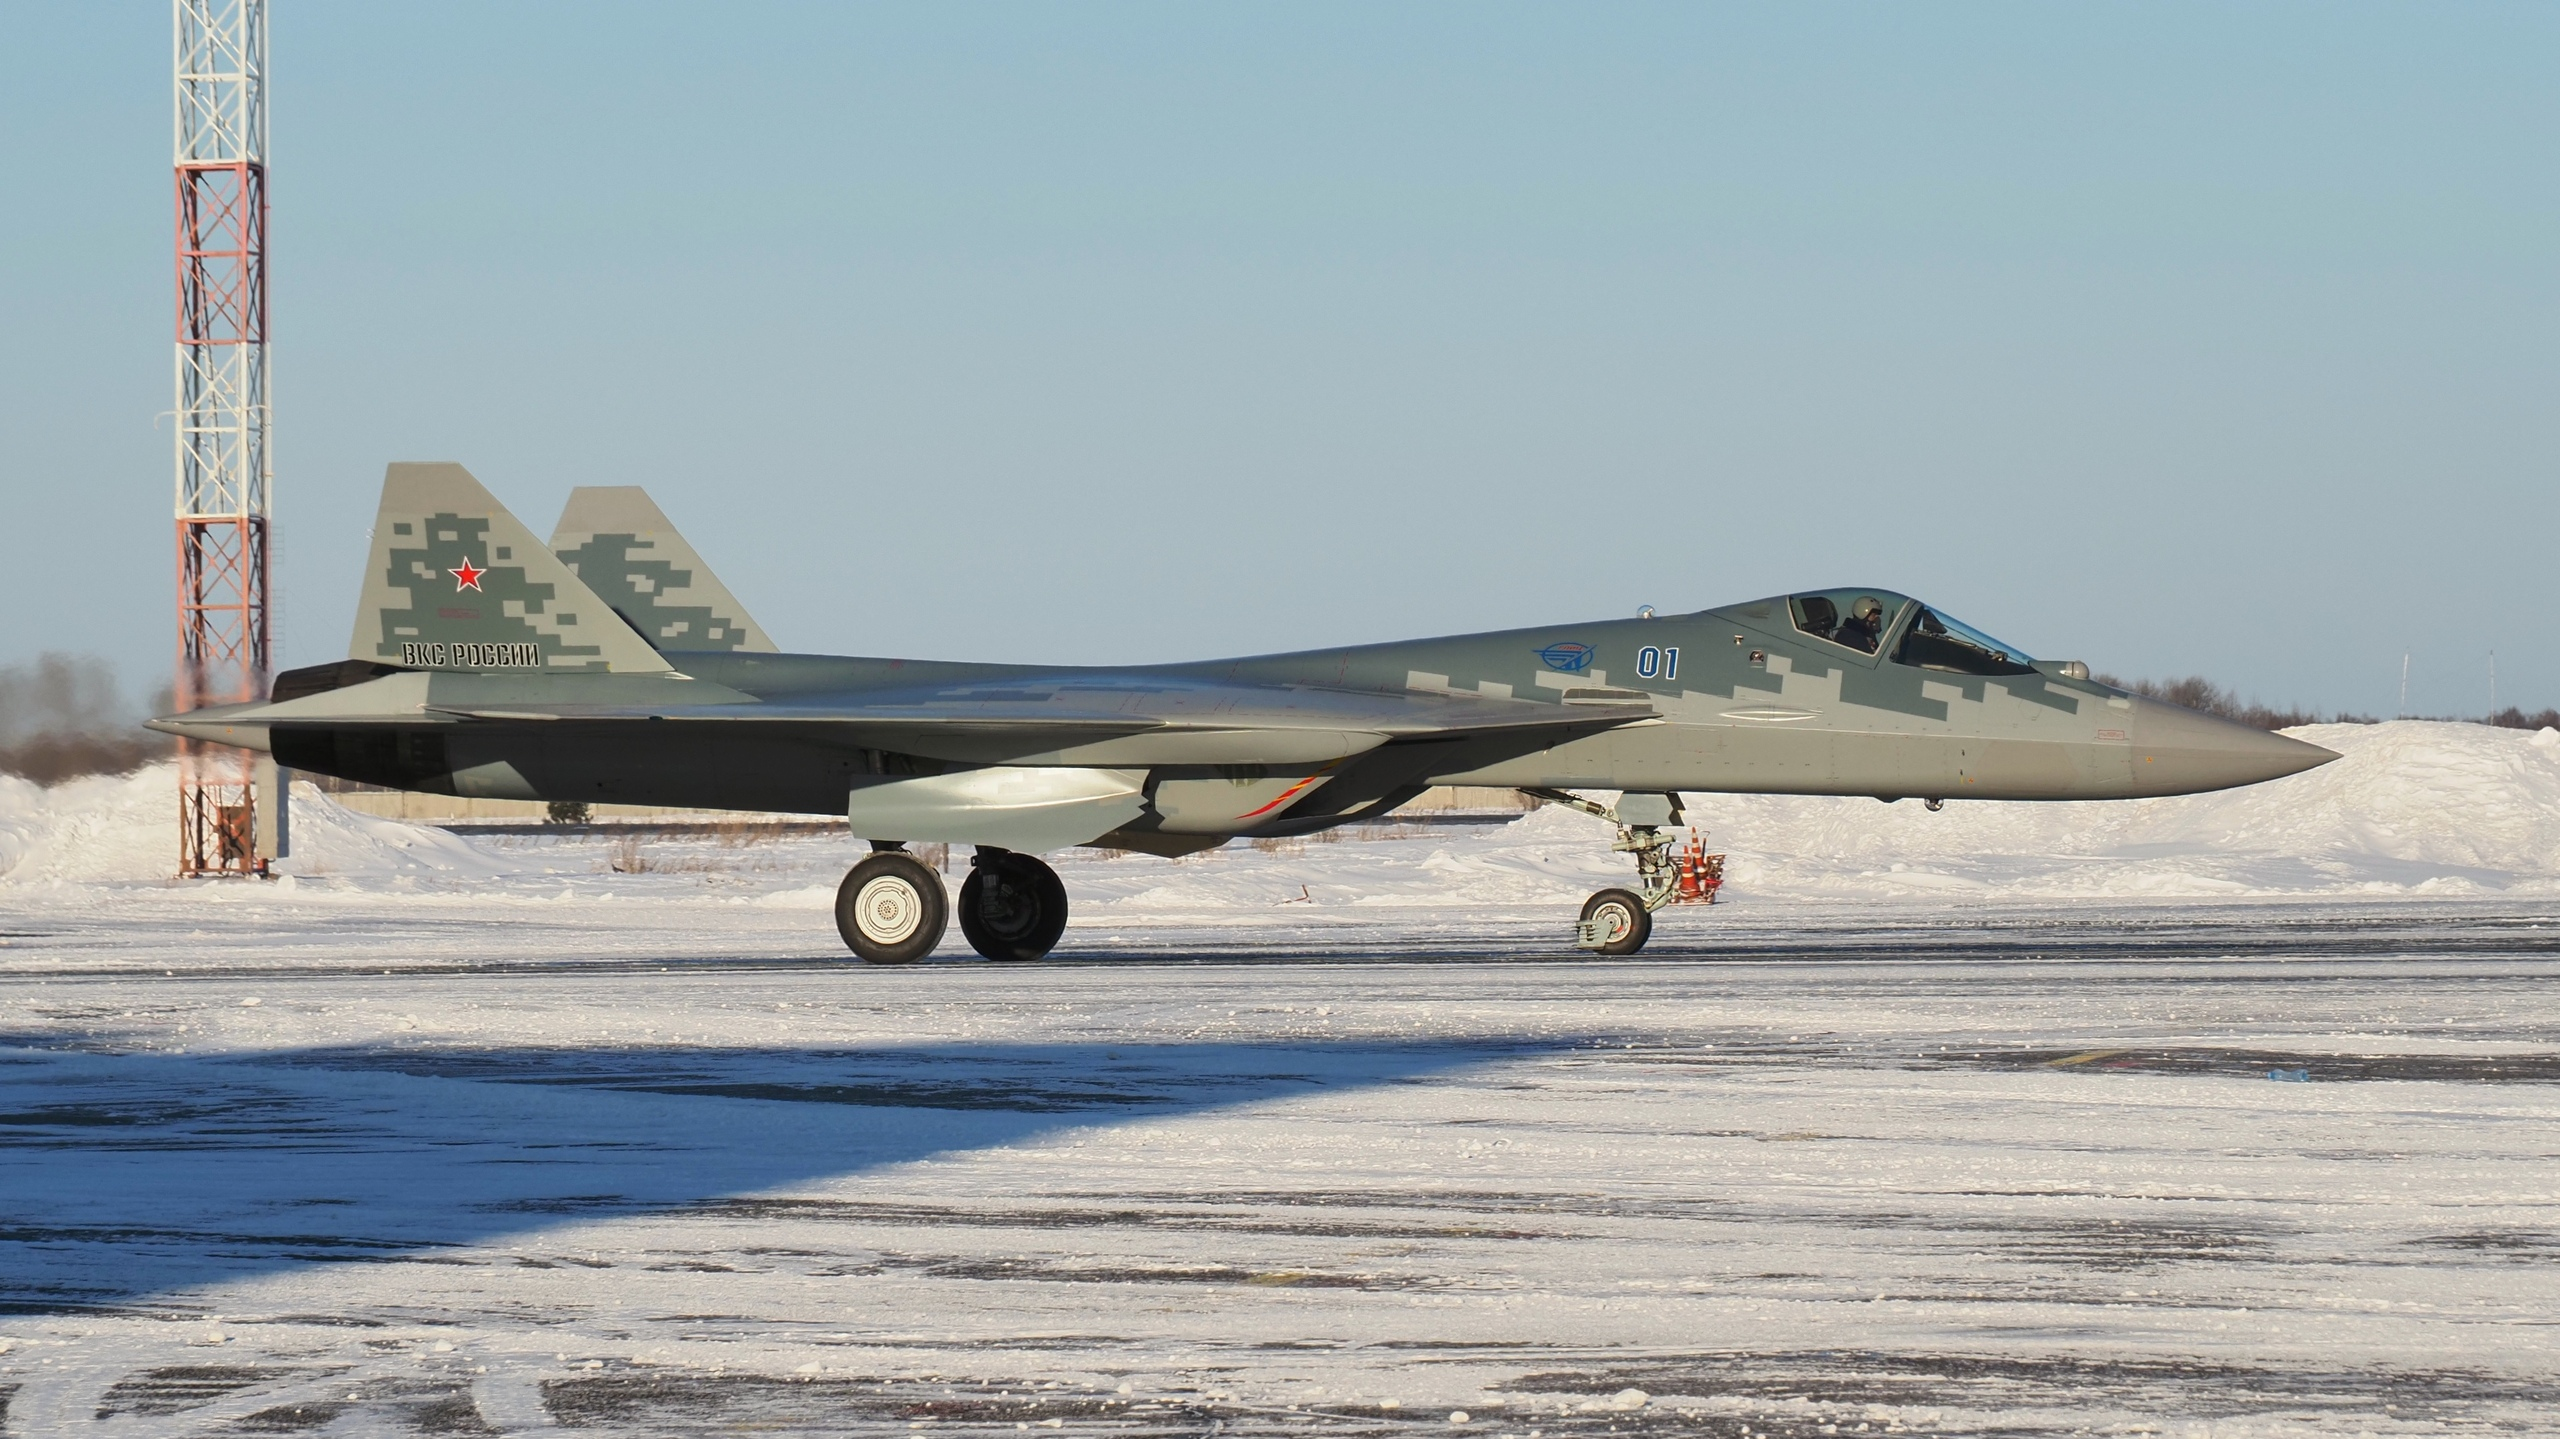 مقاتله Sukhoi T-50 PAK FA سيتغير اسمها الى Su-57  - صفحة 8 EqErLBUW8A8t4r0?format=jpg&name=4096x4096